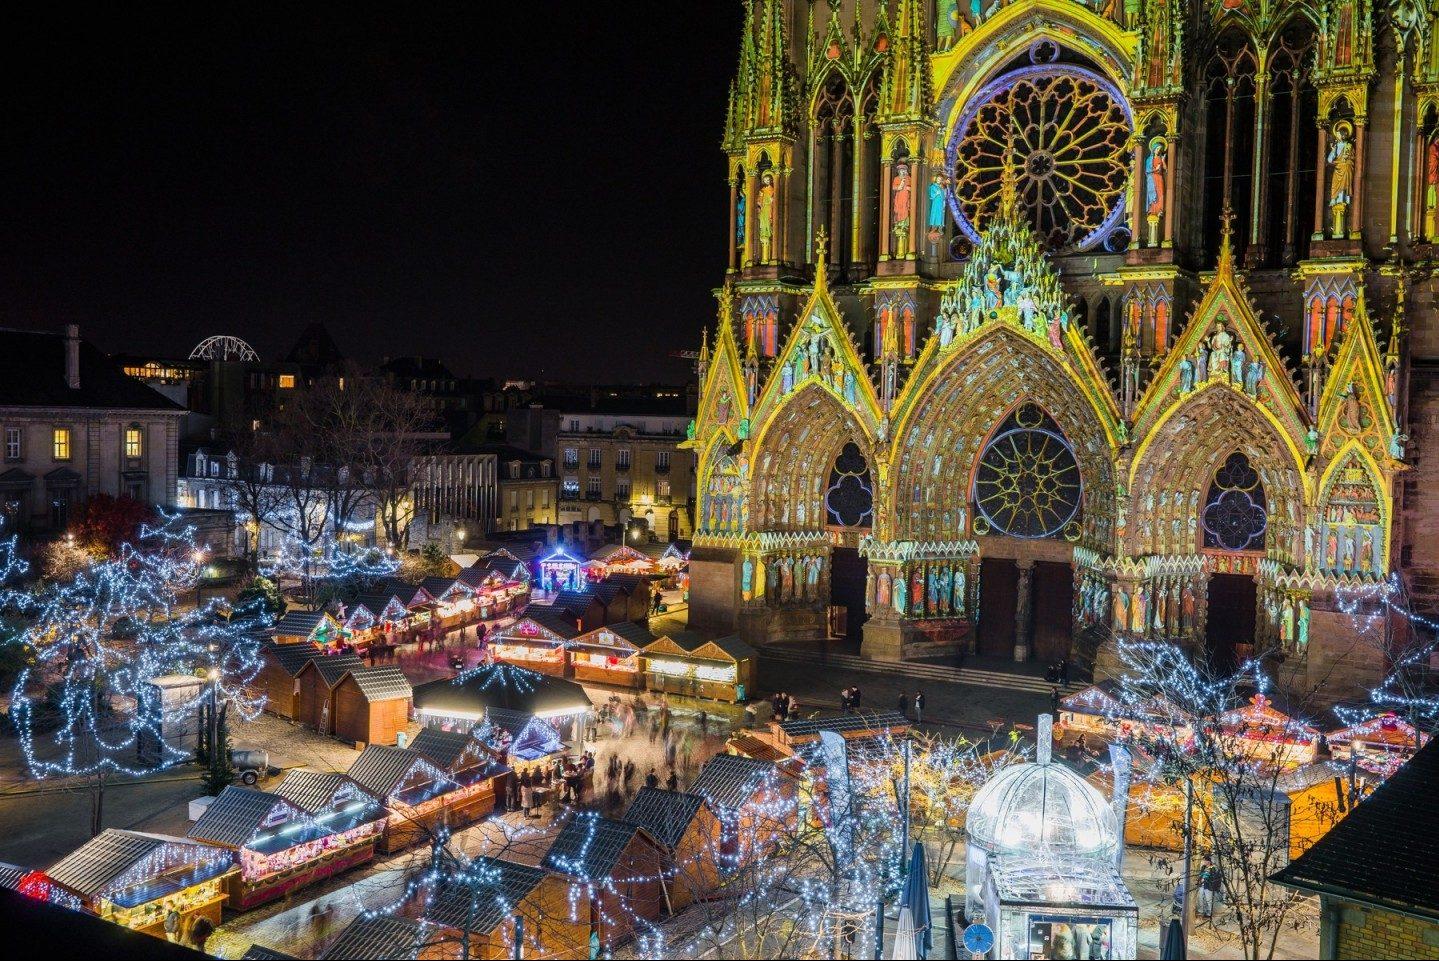 France, Reims Christmas Markets, Champagne, group travel, group tour, holidays © Ville de Reims - Cyril Beudot